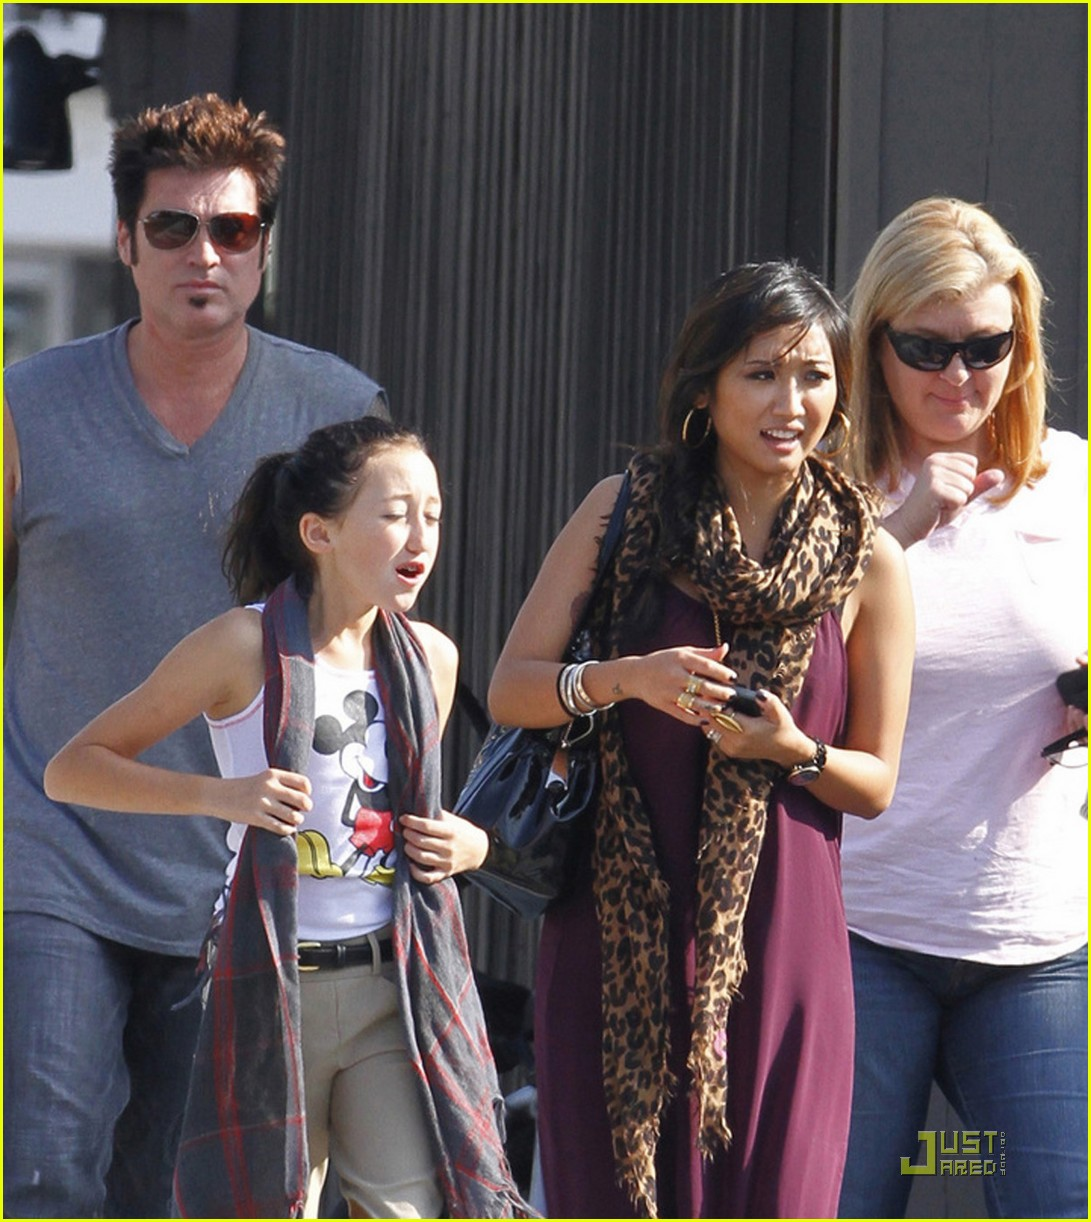 The Cyrus Family 2014 | www.pixshark.com - Images ...